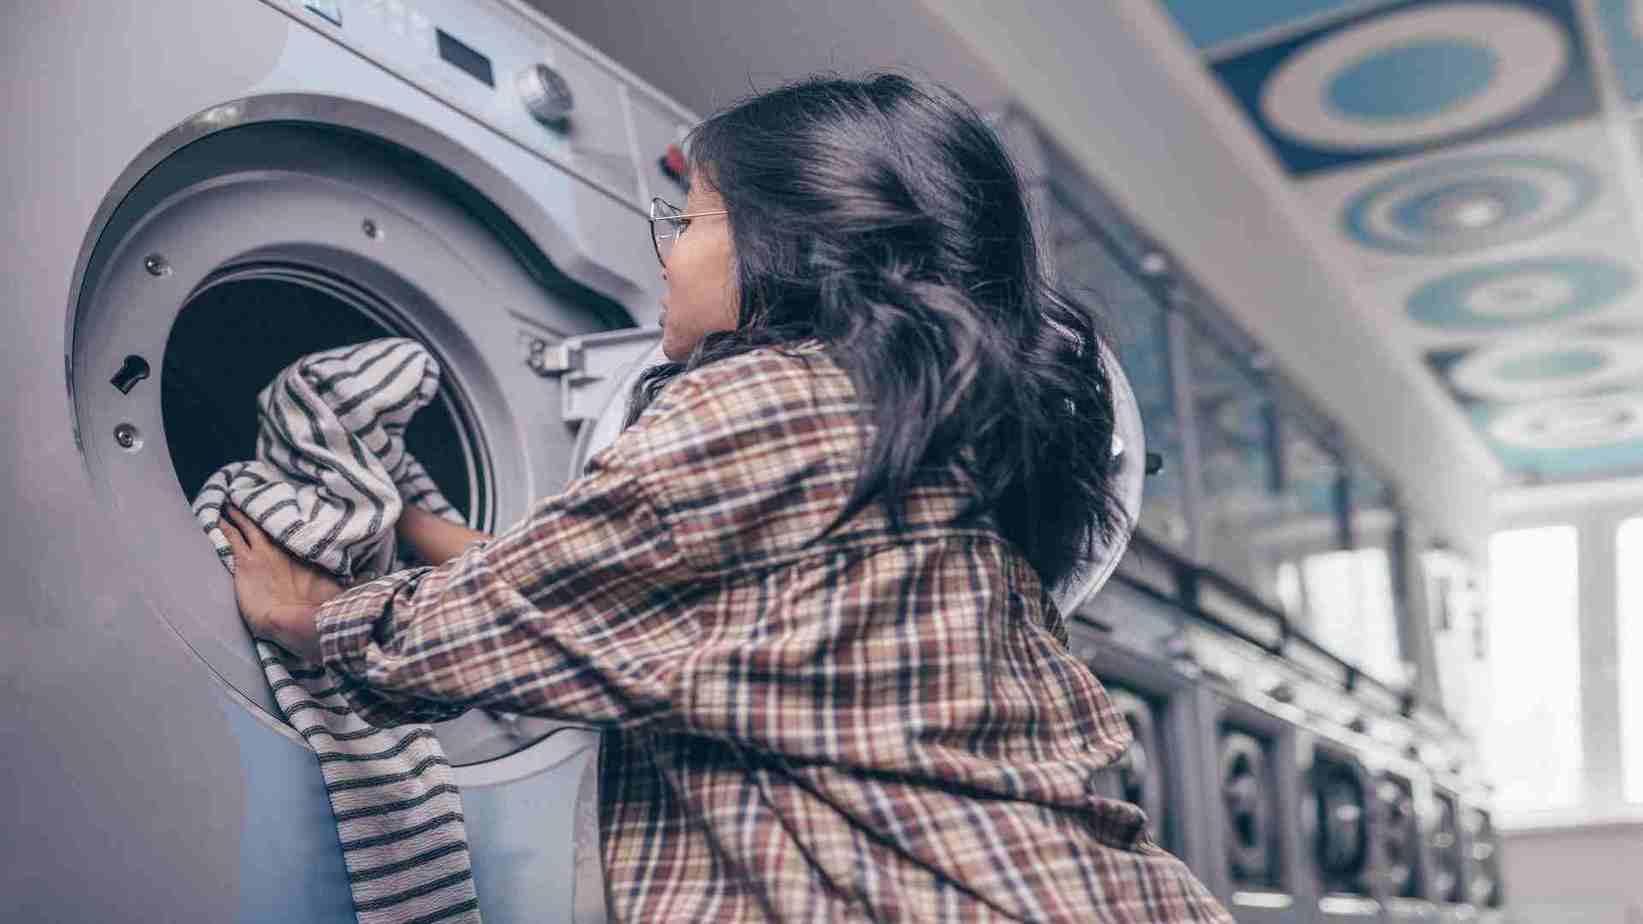 Things To Consider When Buying A Washing Machine Buying Guide